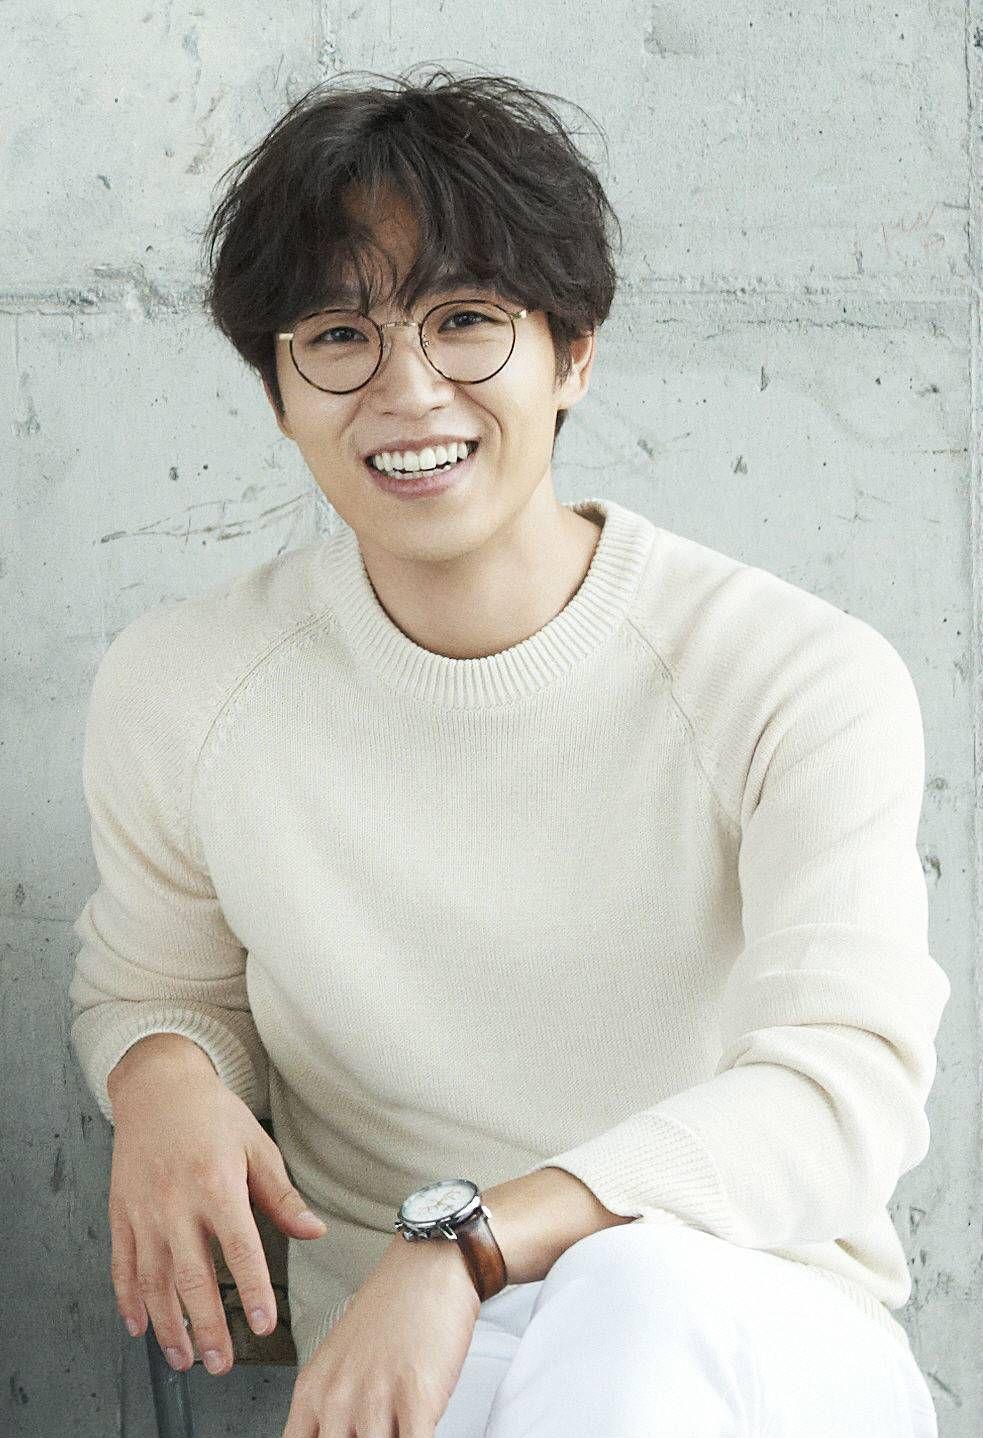 Korean dating site singapore